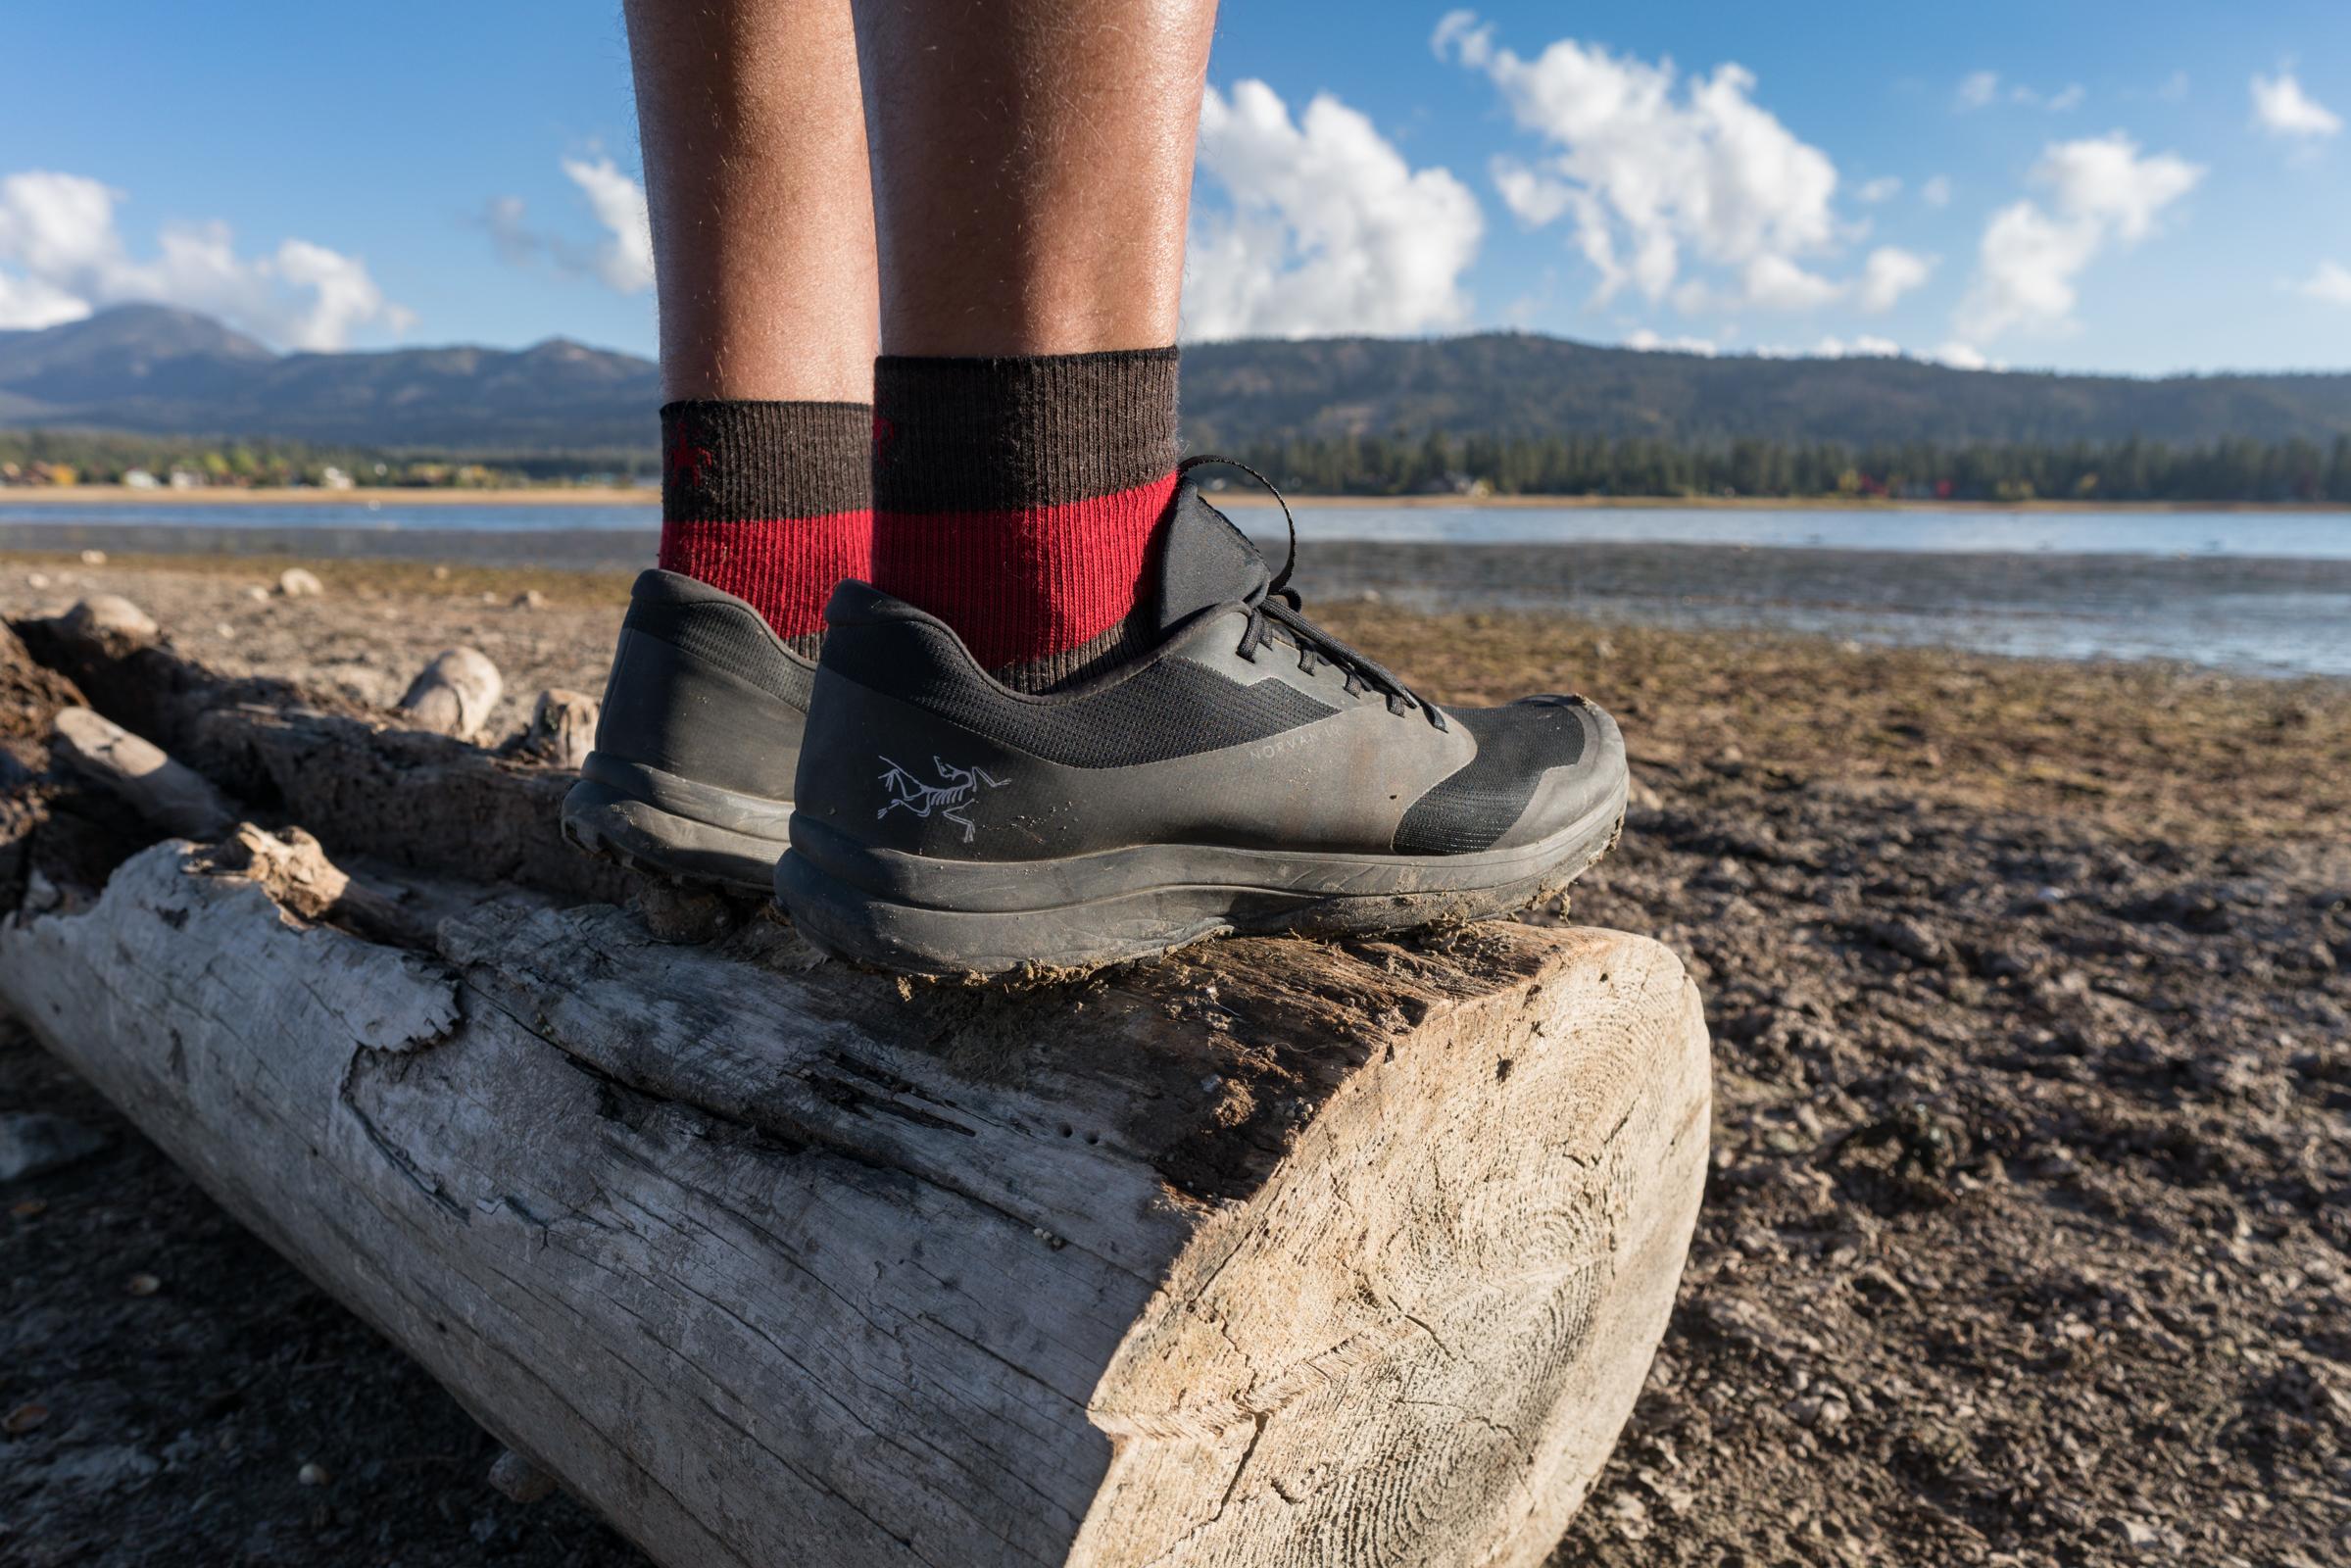 Gear Review: Arc'teryx Norvan LD Trail Shoe Trail to Peak